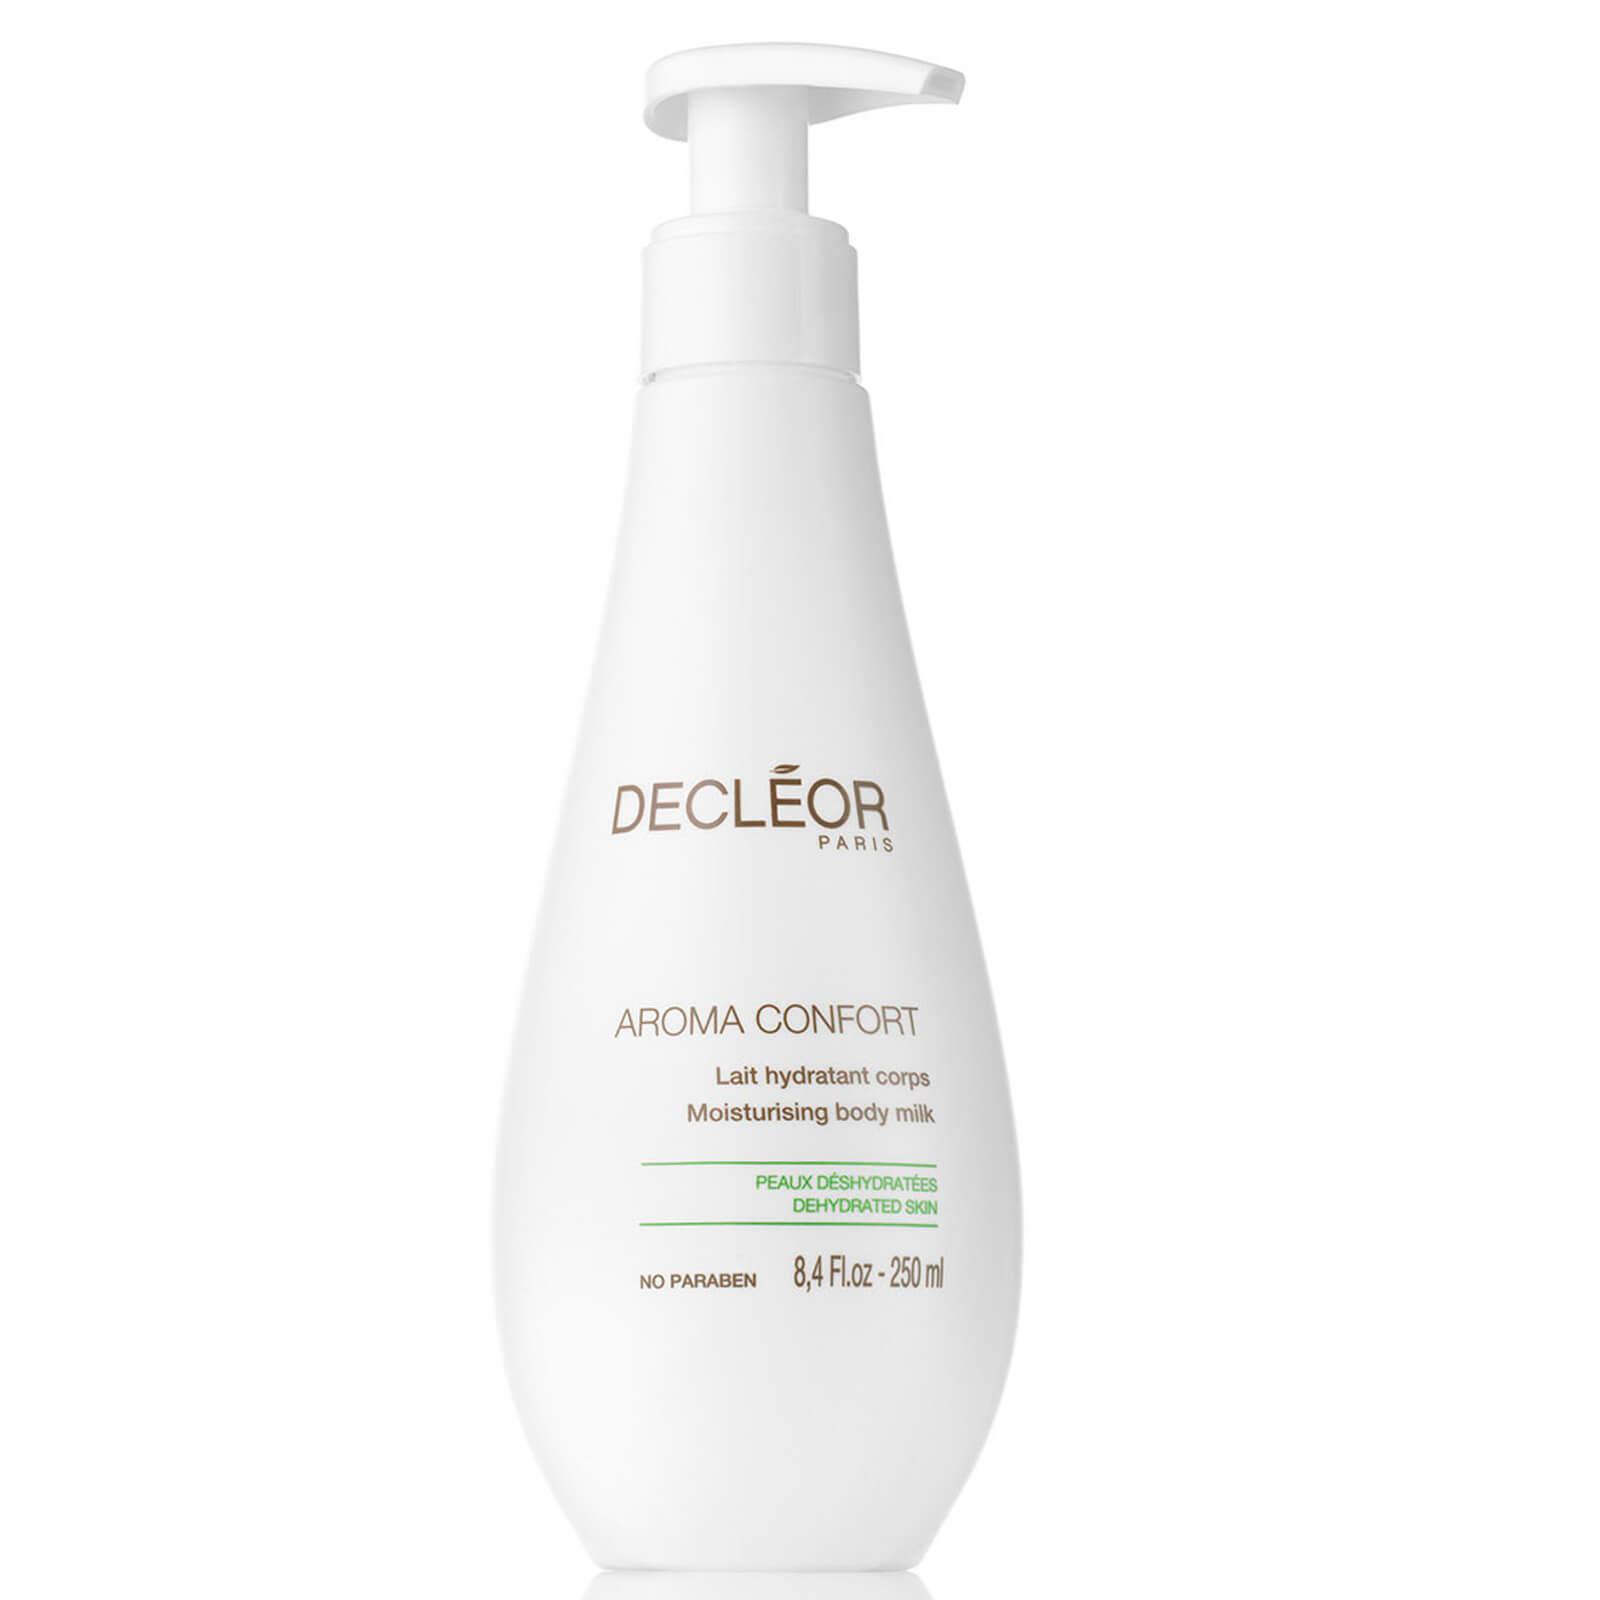 decleor aroma confort